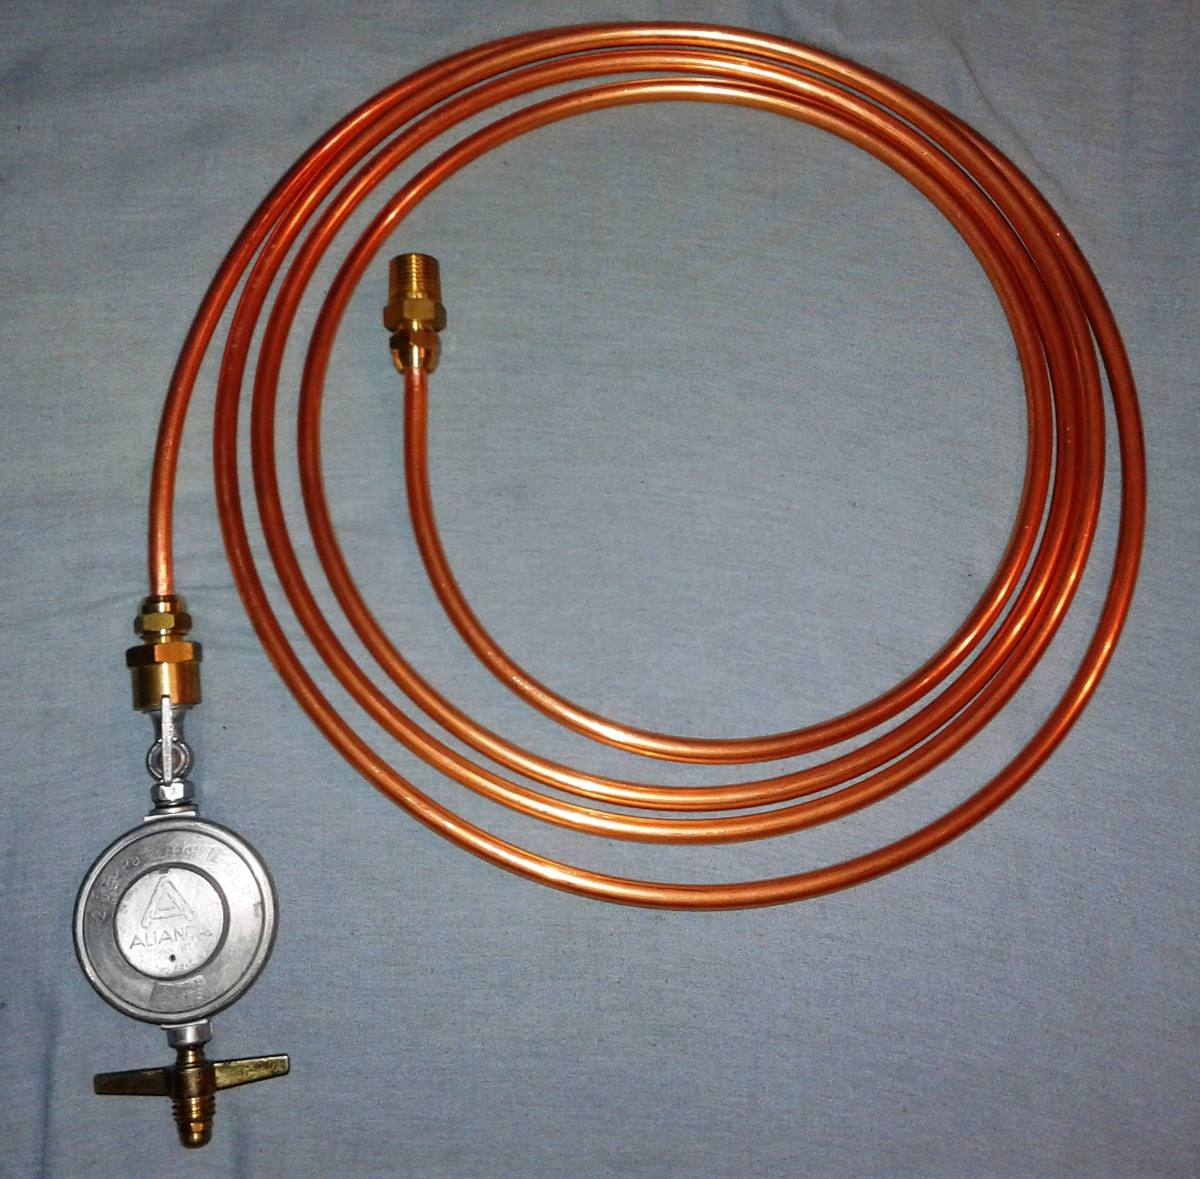 Tubo de cobre 3 8 flex gas 6mts registro adaptadores - Tubo de cobre para gas ...